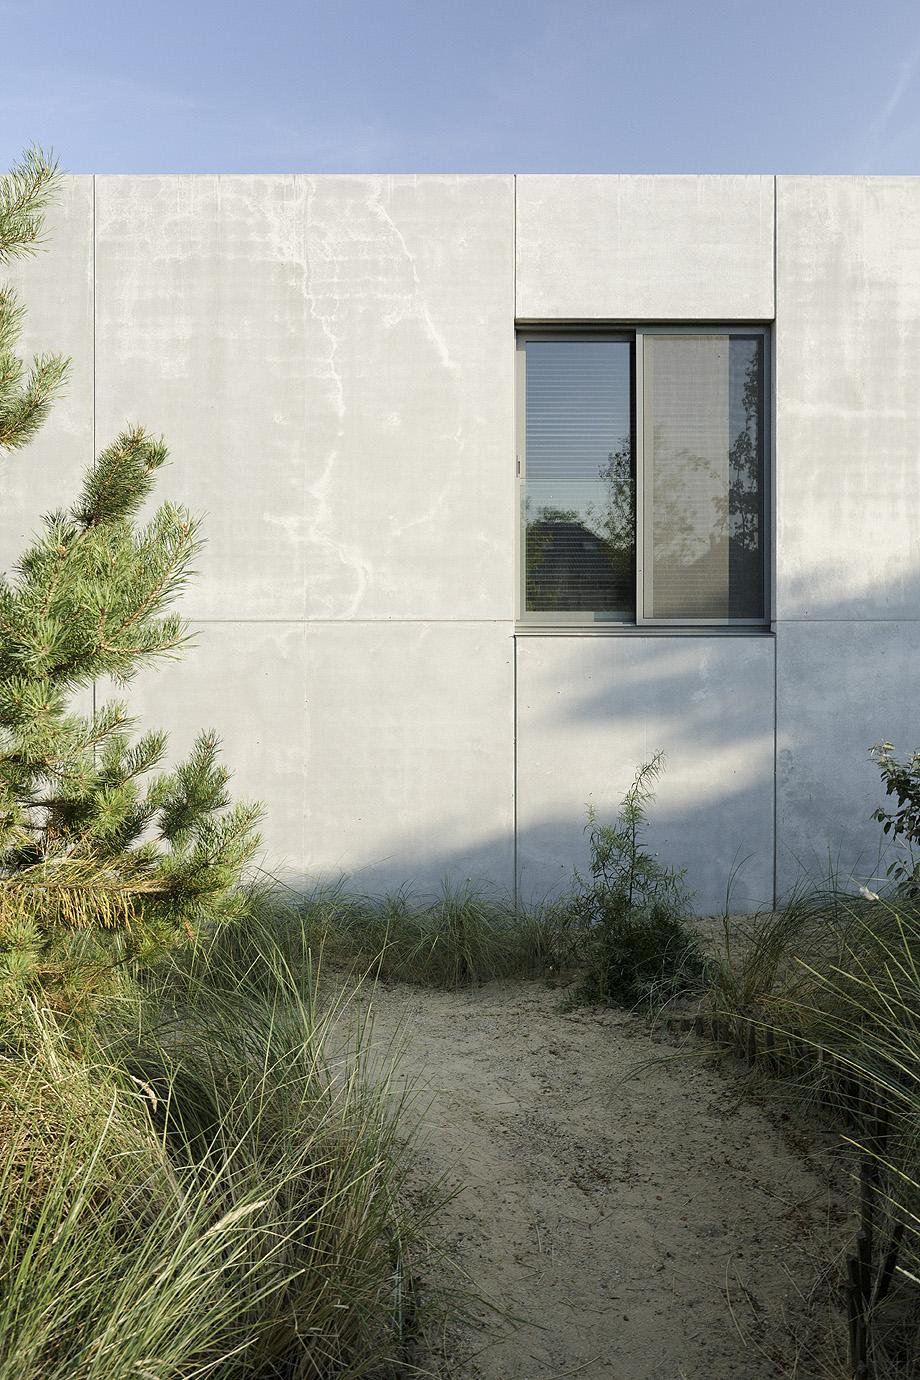 casa vle de ism architecten y paul ibens (19)